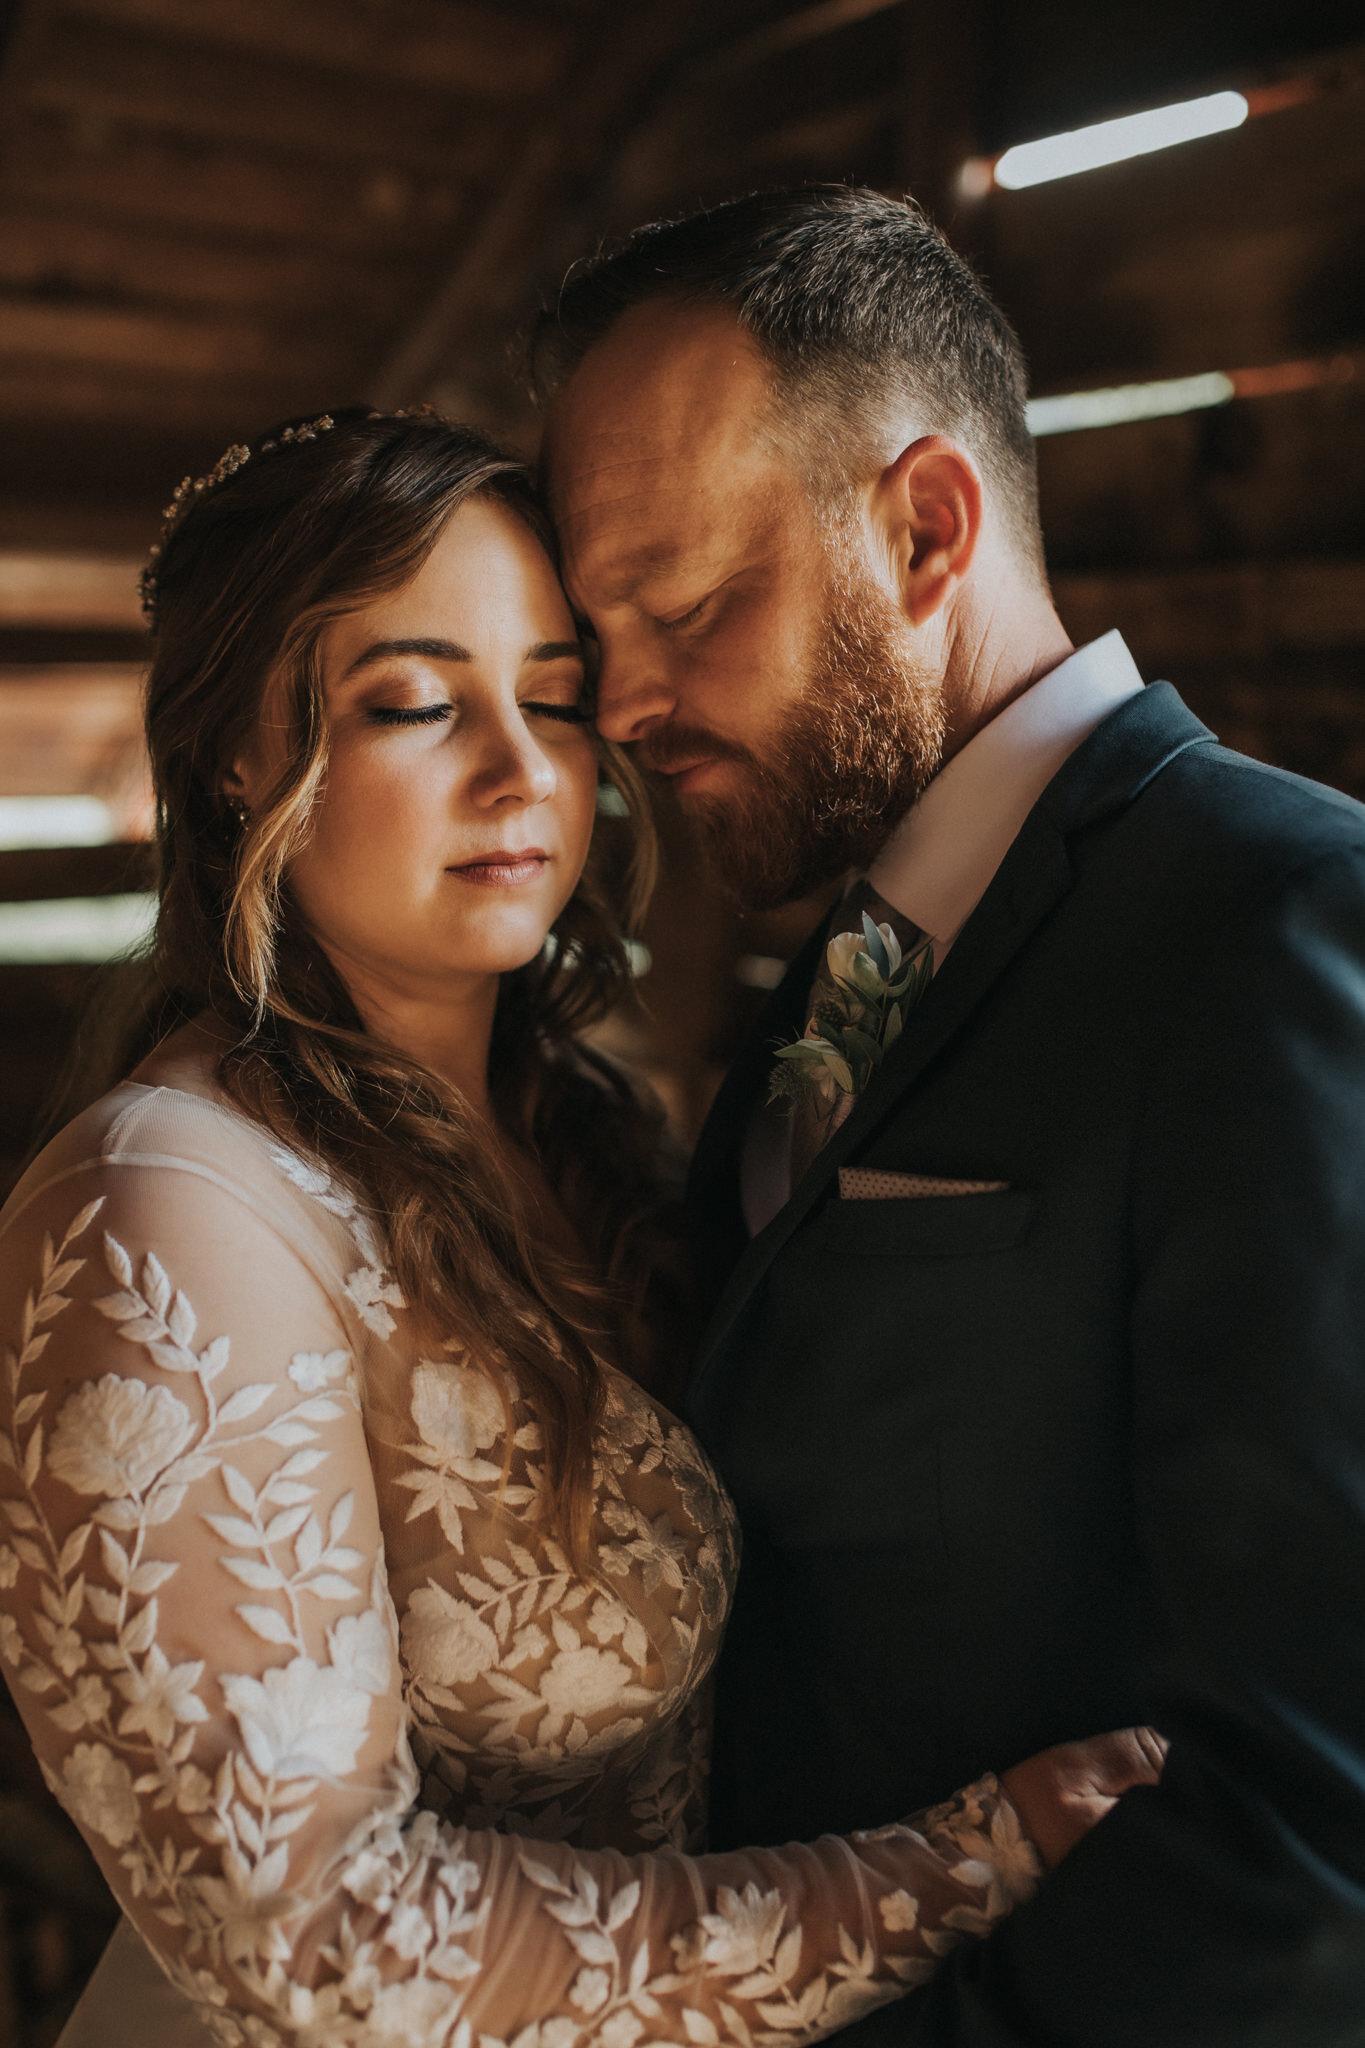 KateMatt-North-Georgia-Wedding-Photographer-Mountain-Laurel-Farm-120.jpg